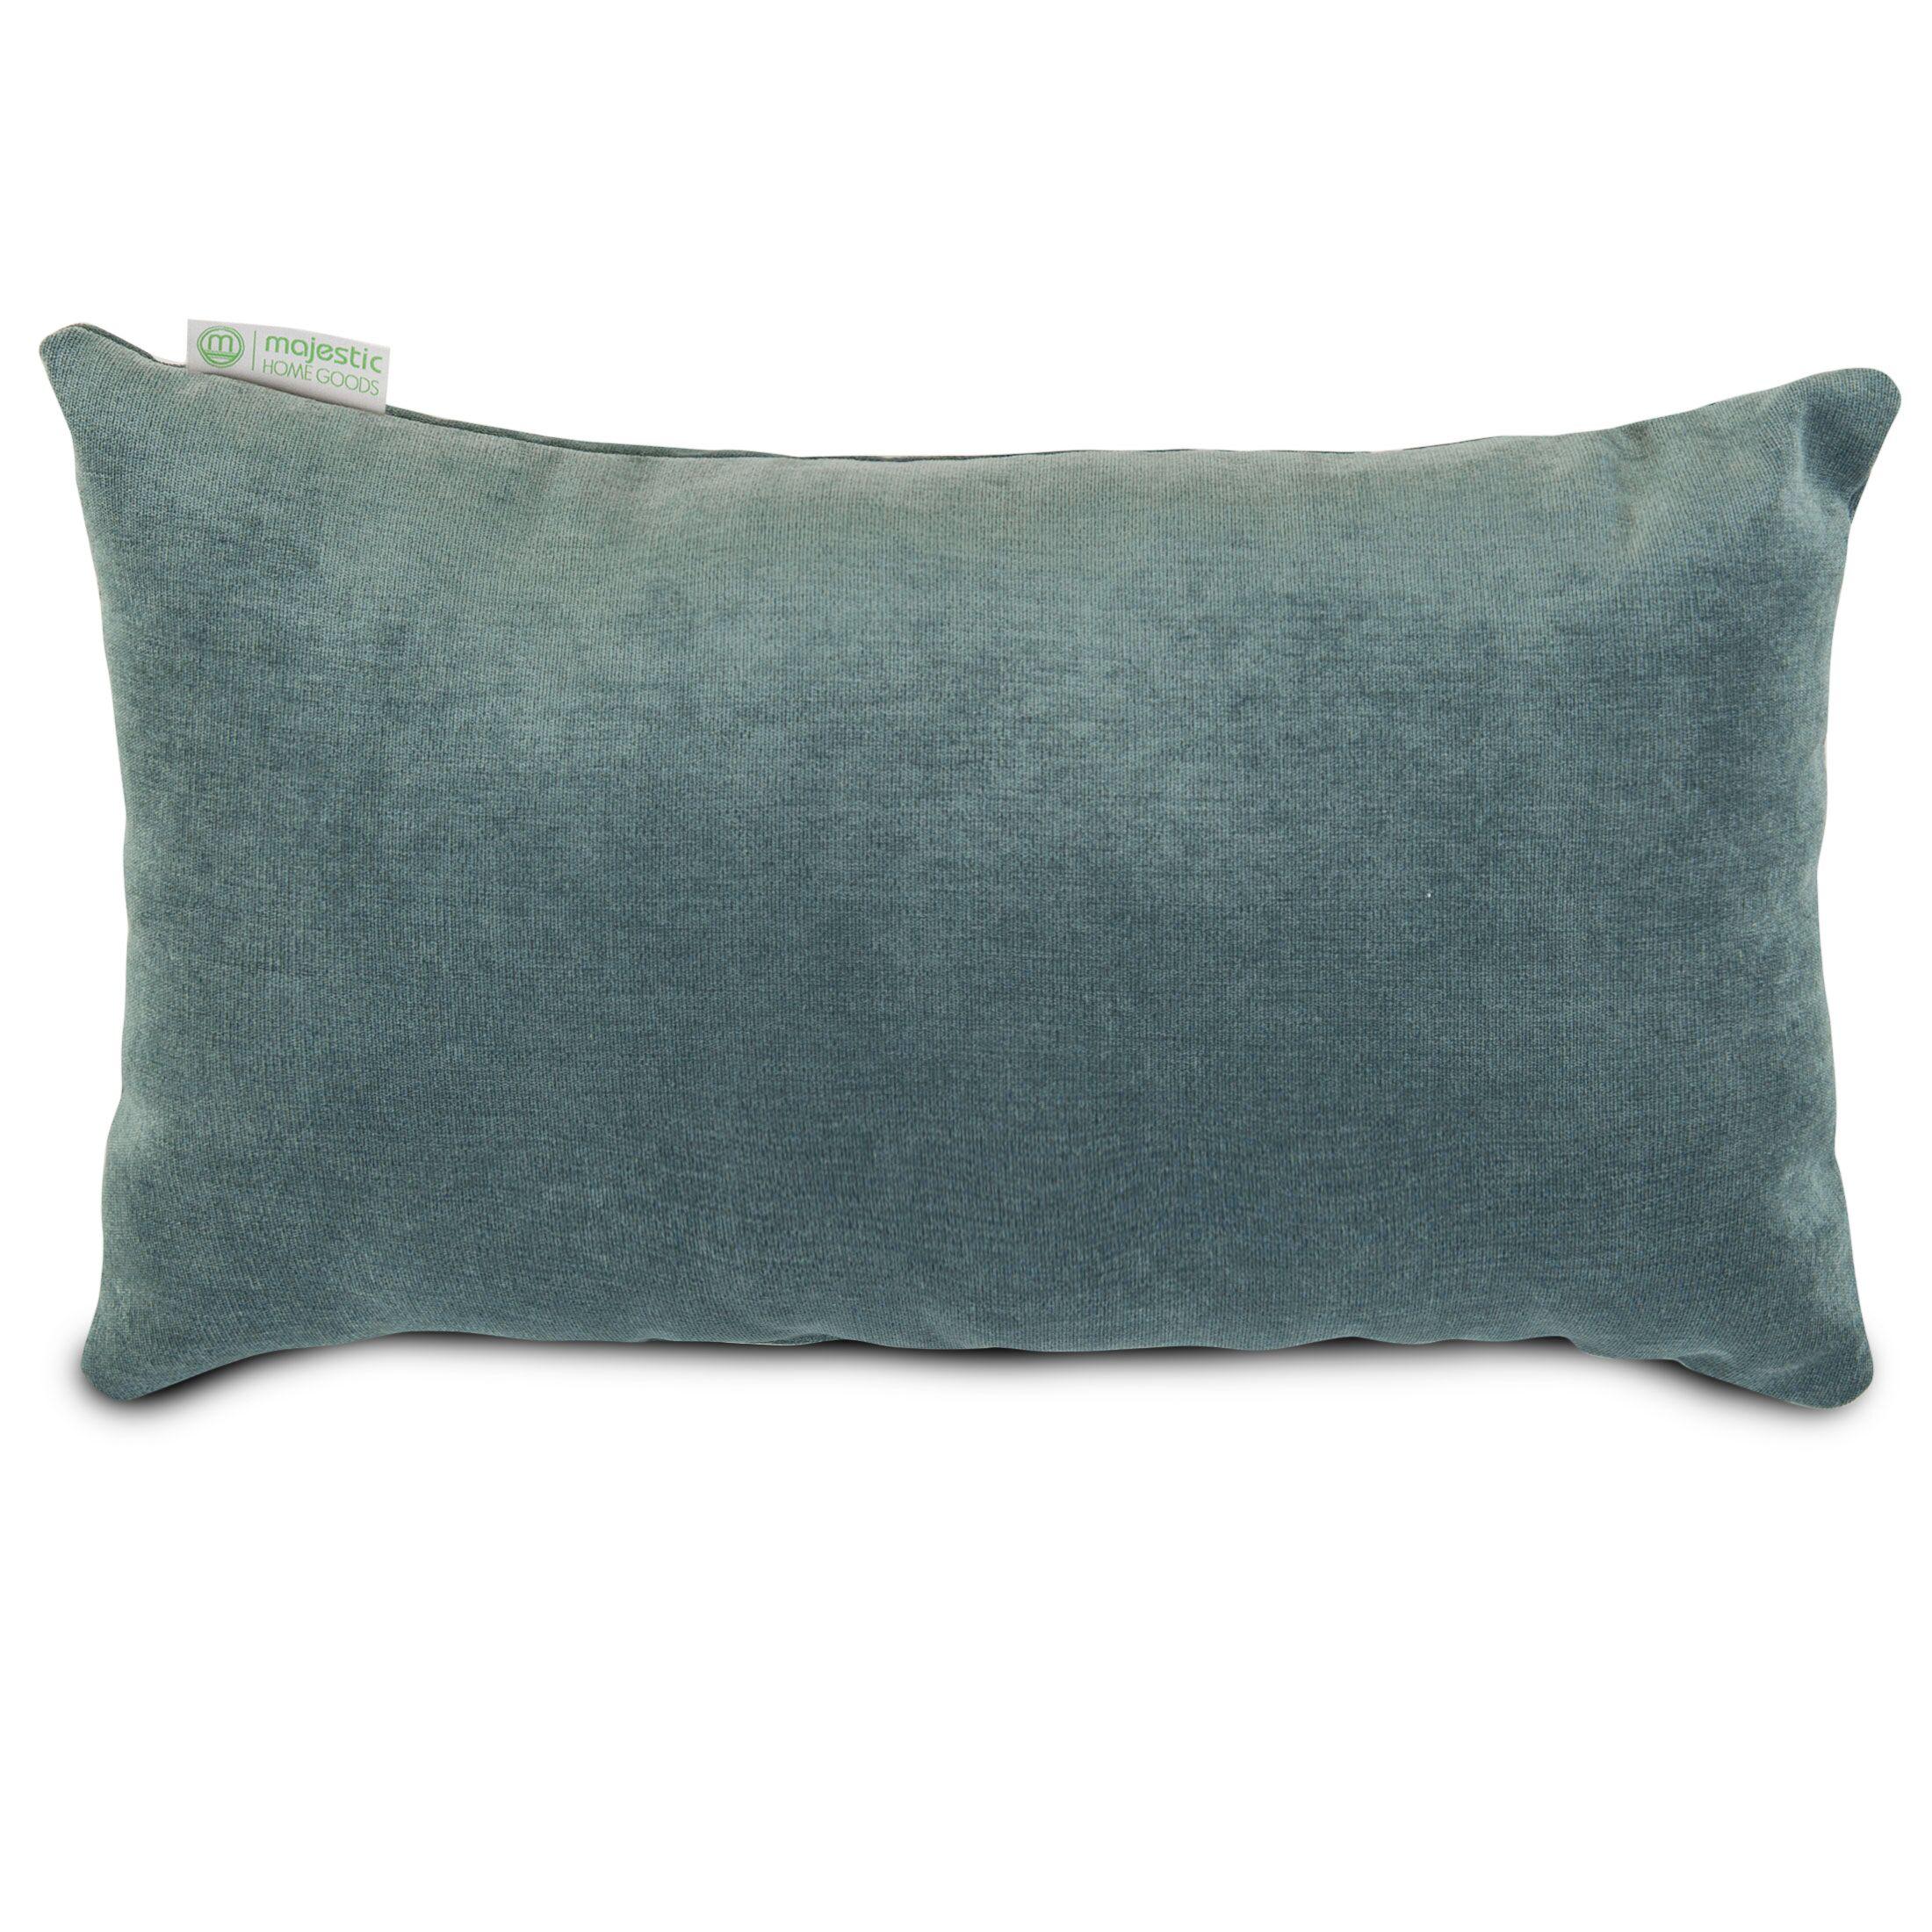 Edwards Velvet Lumbar Pillow Color: Azure